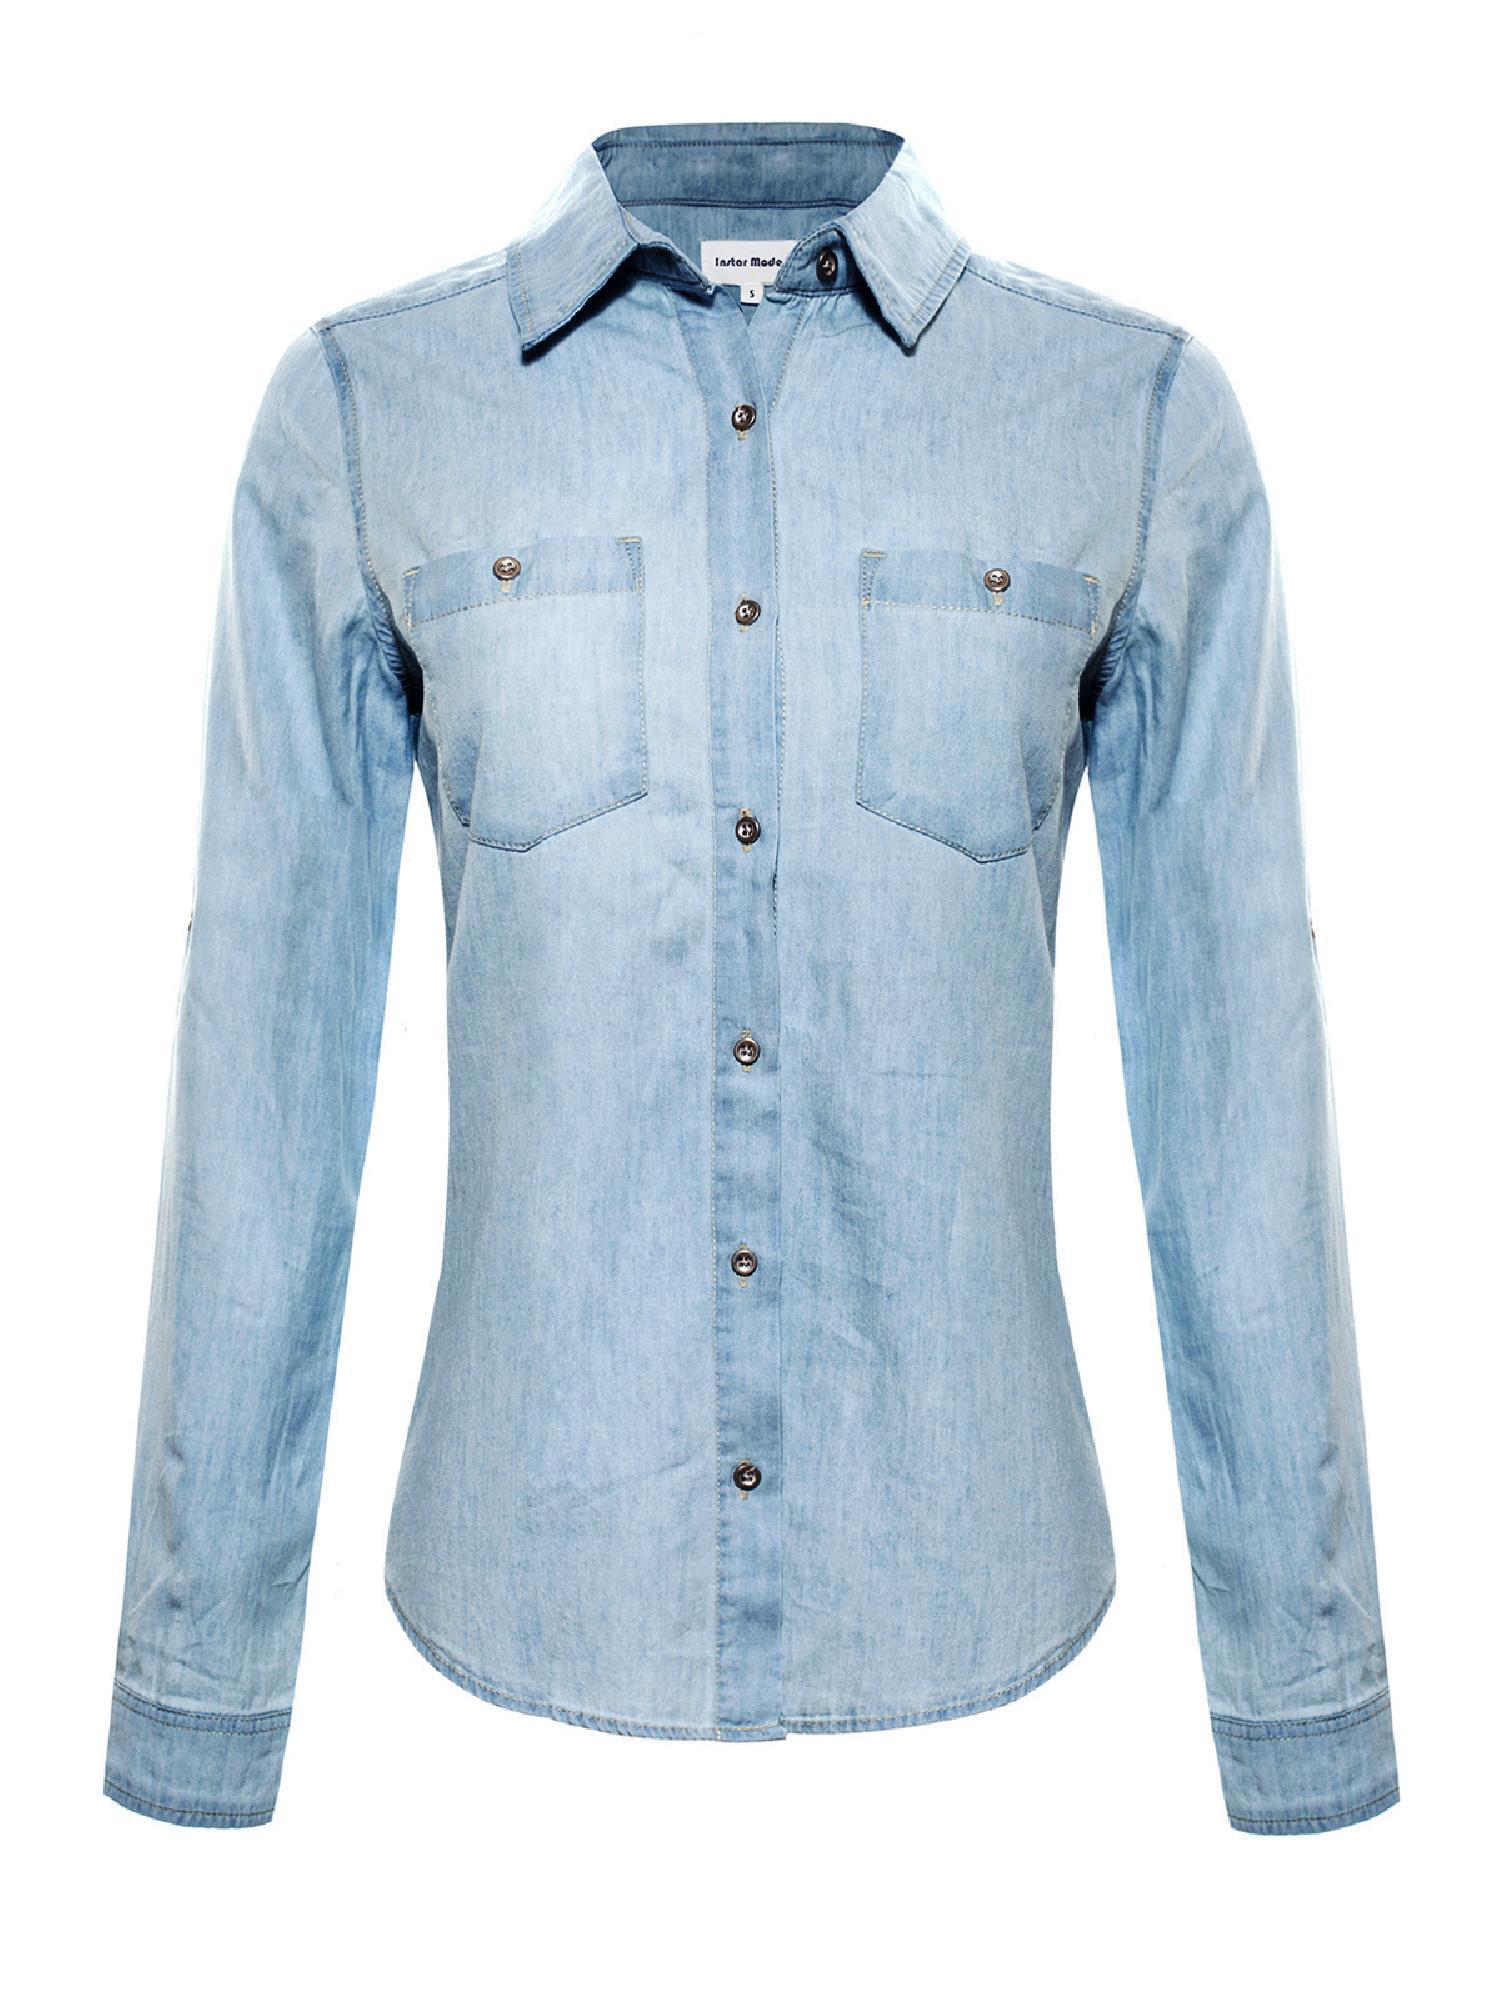 Made by Olivia Women's Basic Classic Roll up Sleeve Button Down Chambray Denim Shirt (S-3XL) Medium Denim L